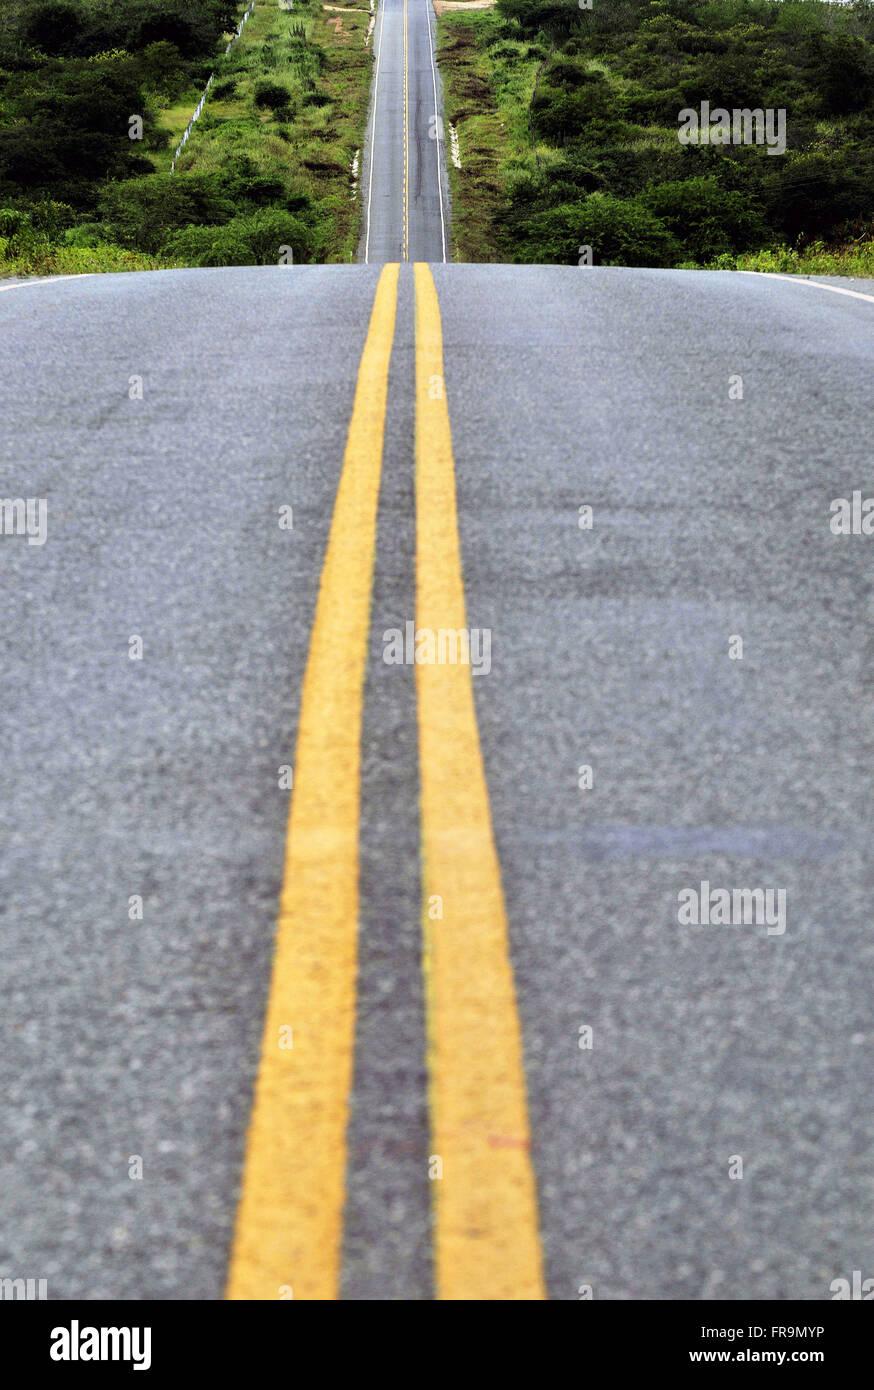 EC-363 highway between the cities of Ceará Taua and Mombaca - Stock Image